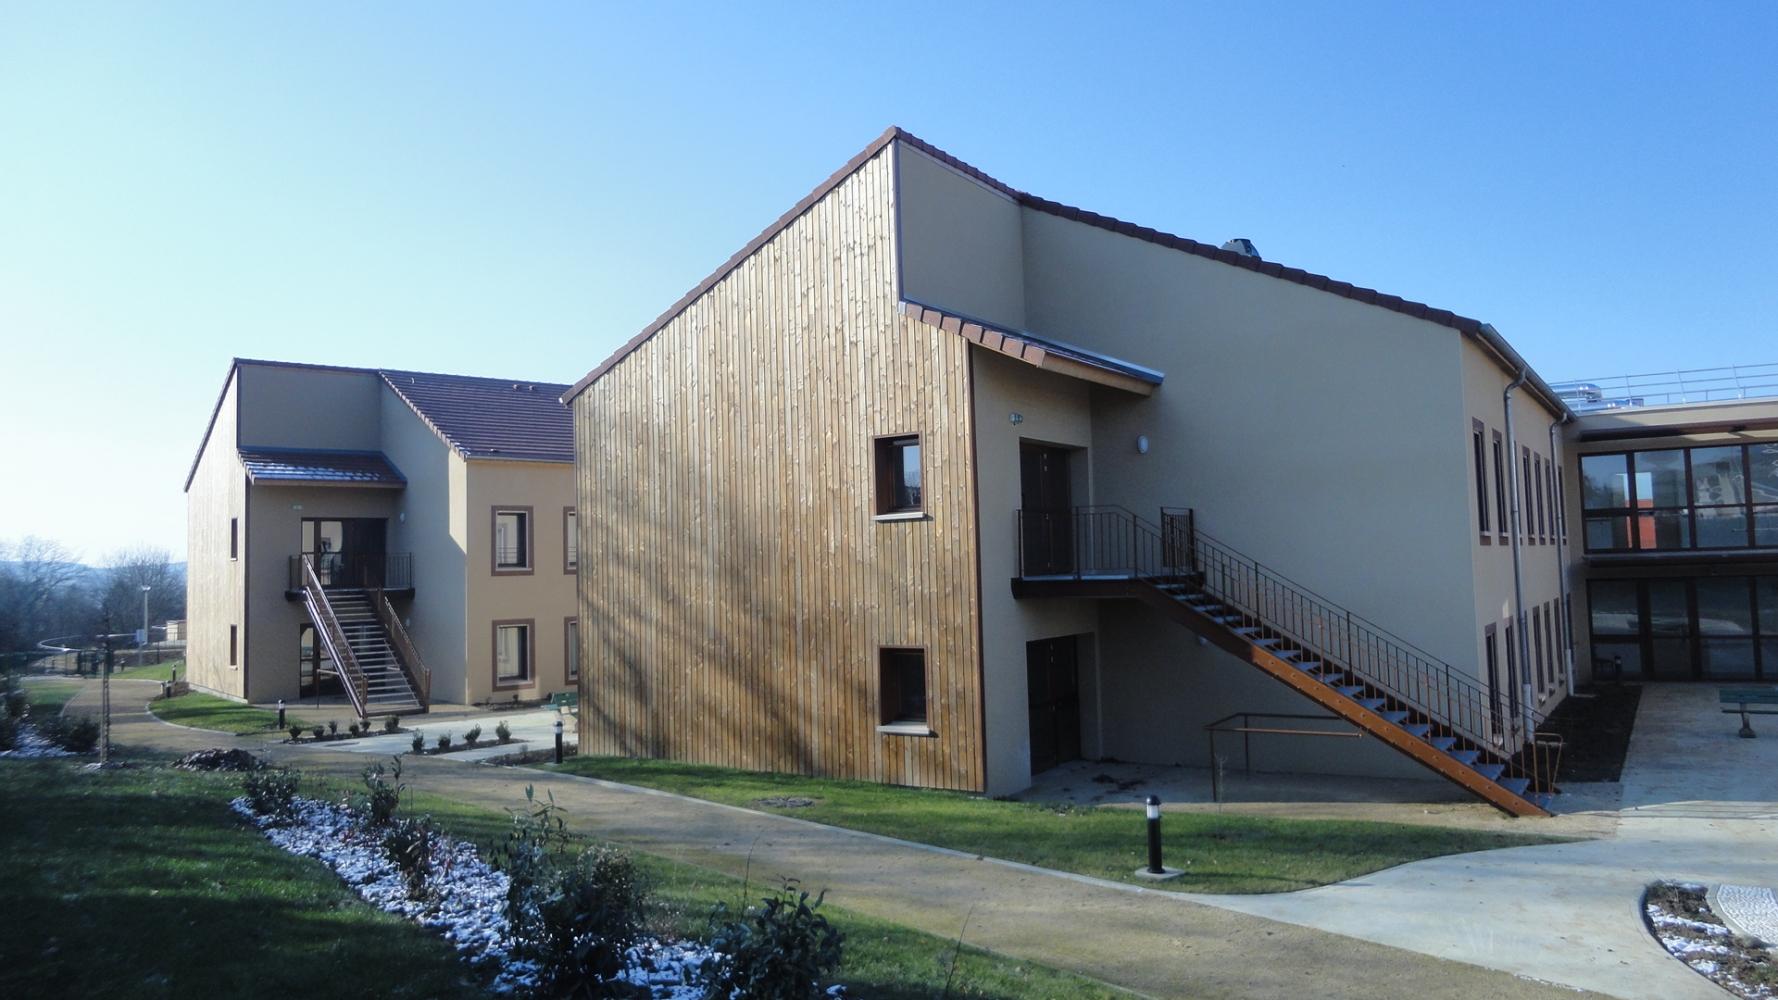 11-carignan-img-014 Pascale SEURIN Architecte - Pascale SEURIN Architecte